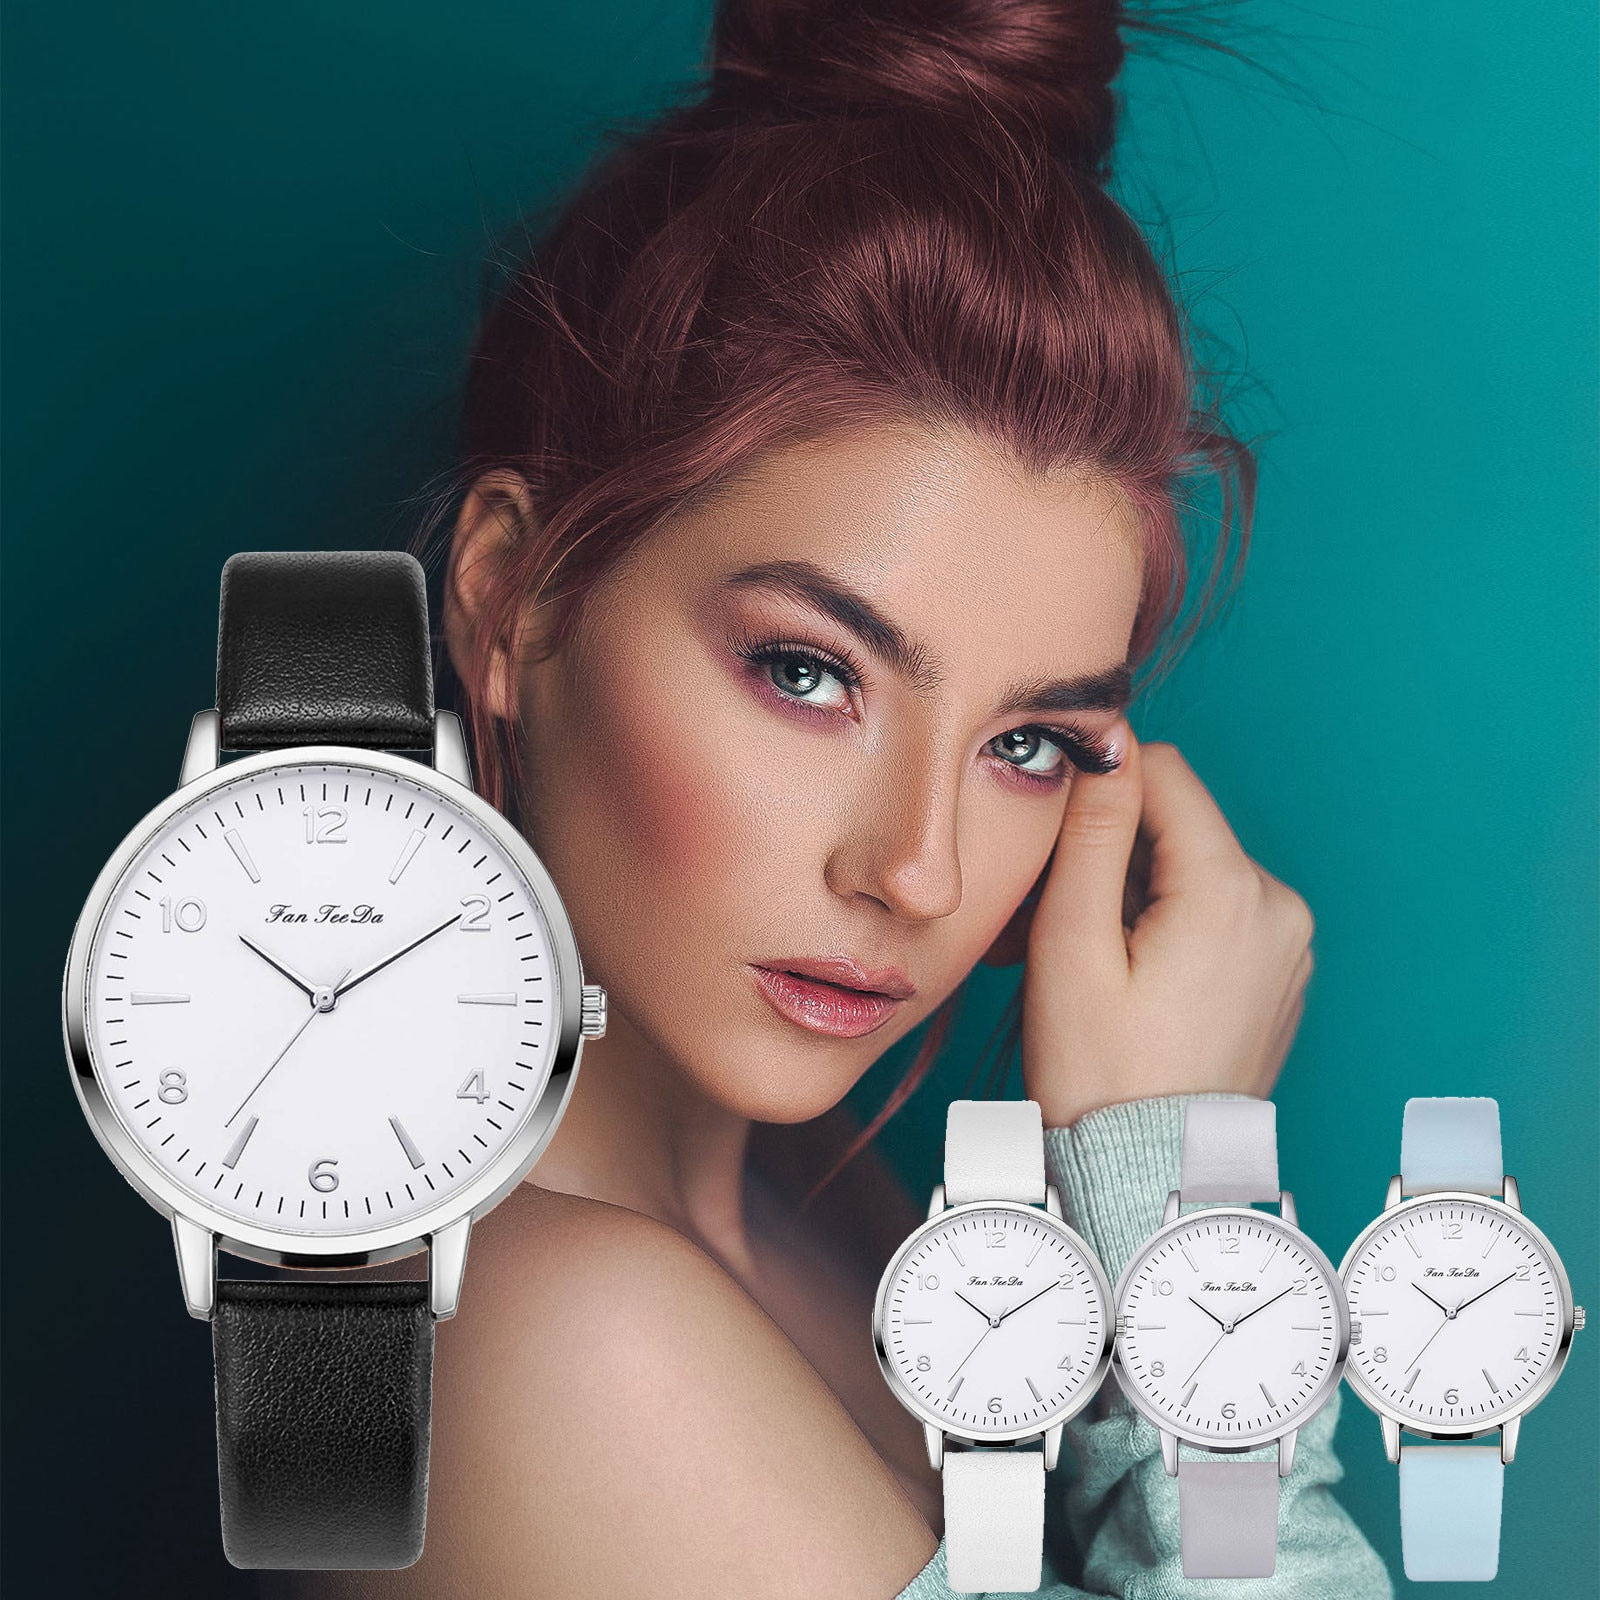 Luxury Quartz Alloy Watch Women Ladies Fashion Stainless Steel Dial Casual Bracele Watch Leather Wri